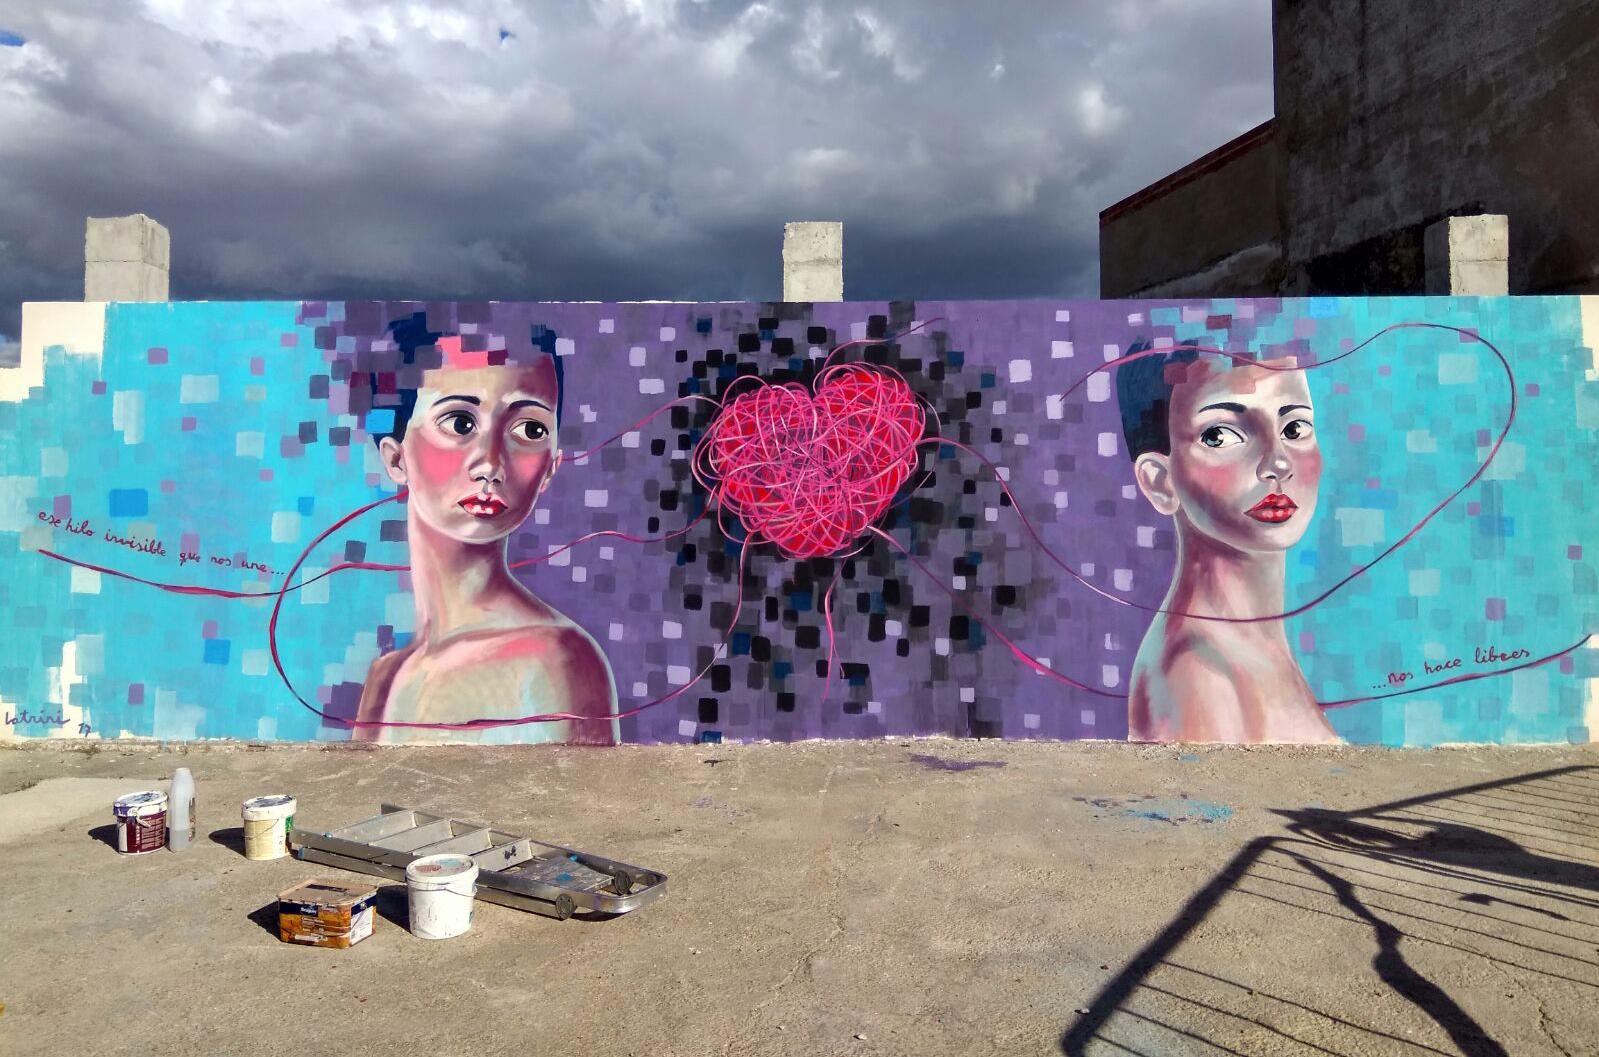 Mural .Festival arte urbano